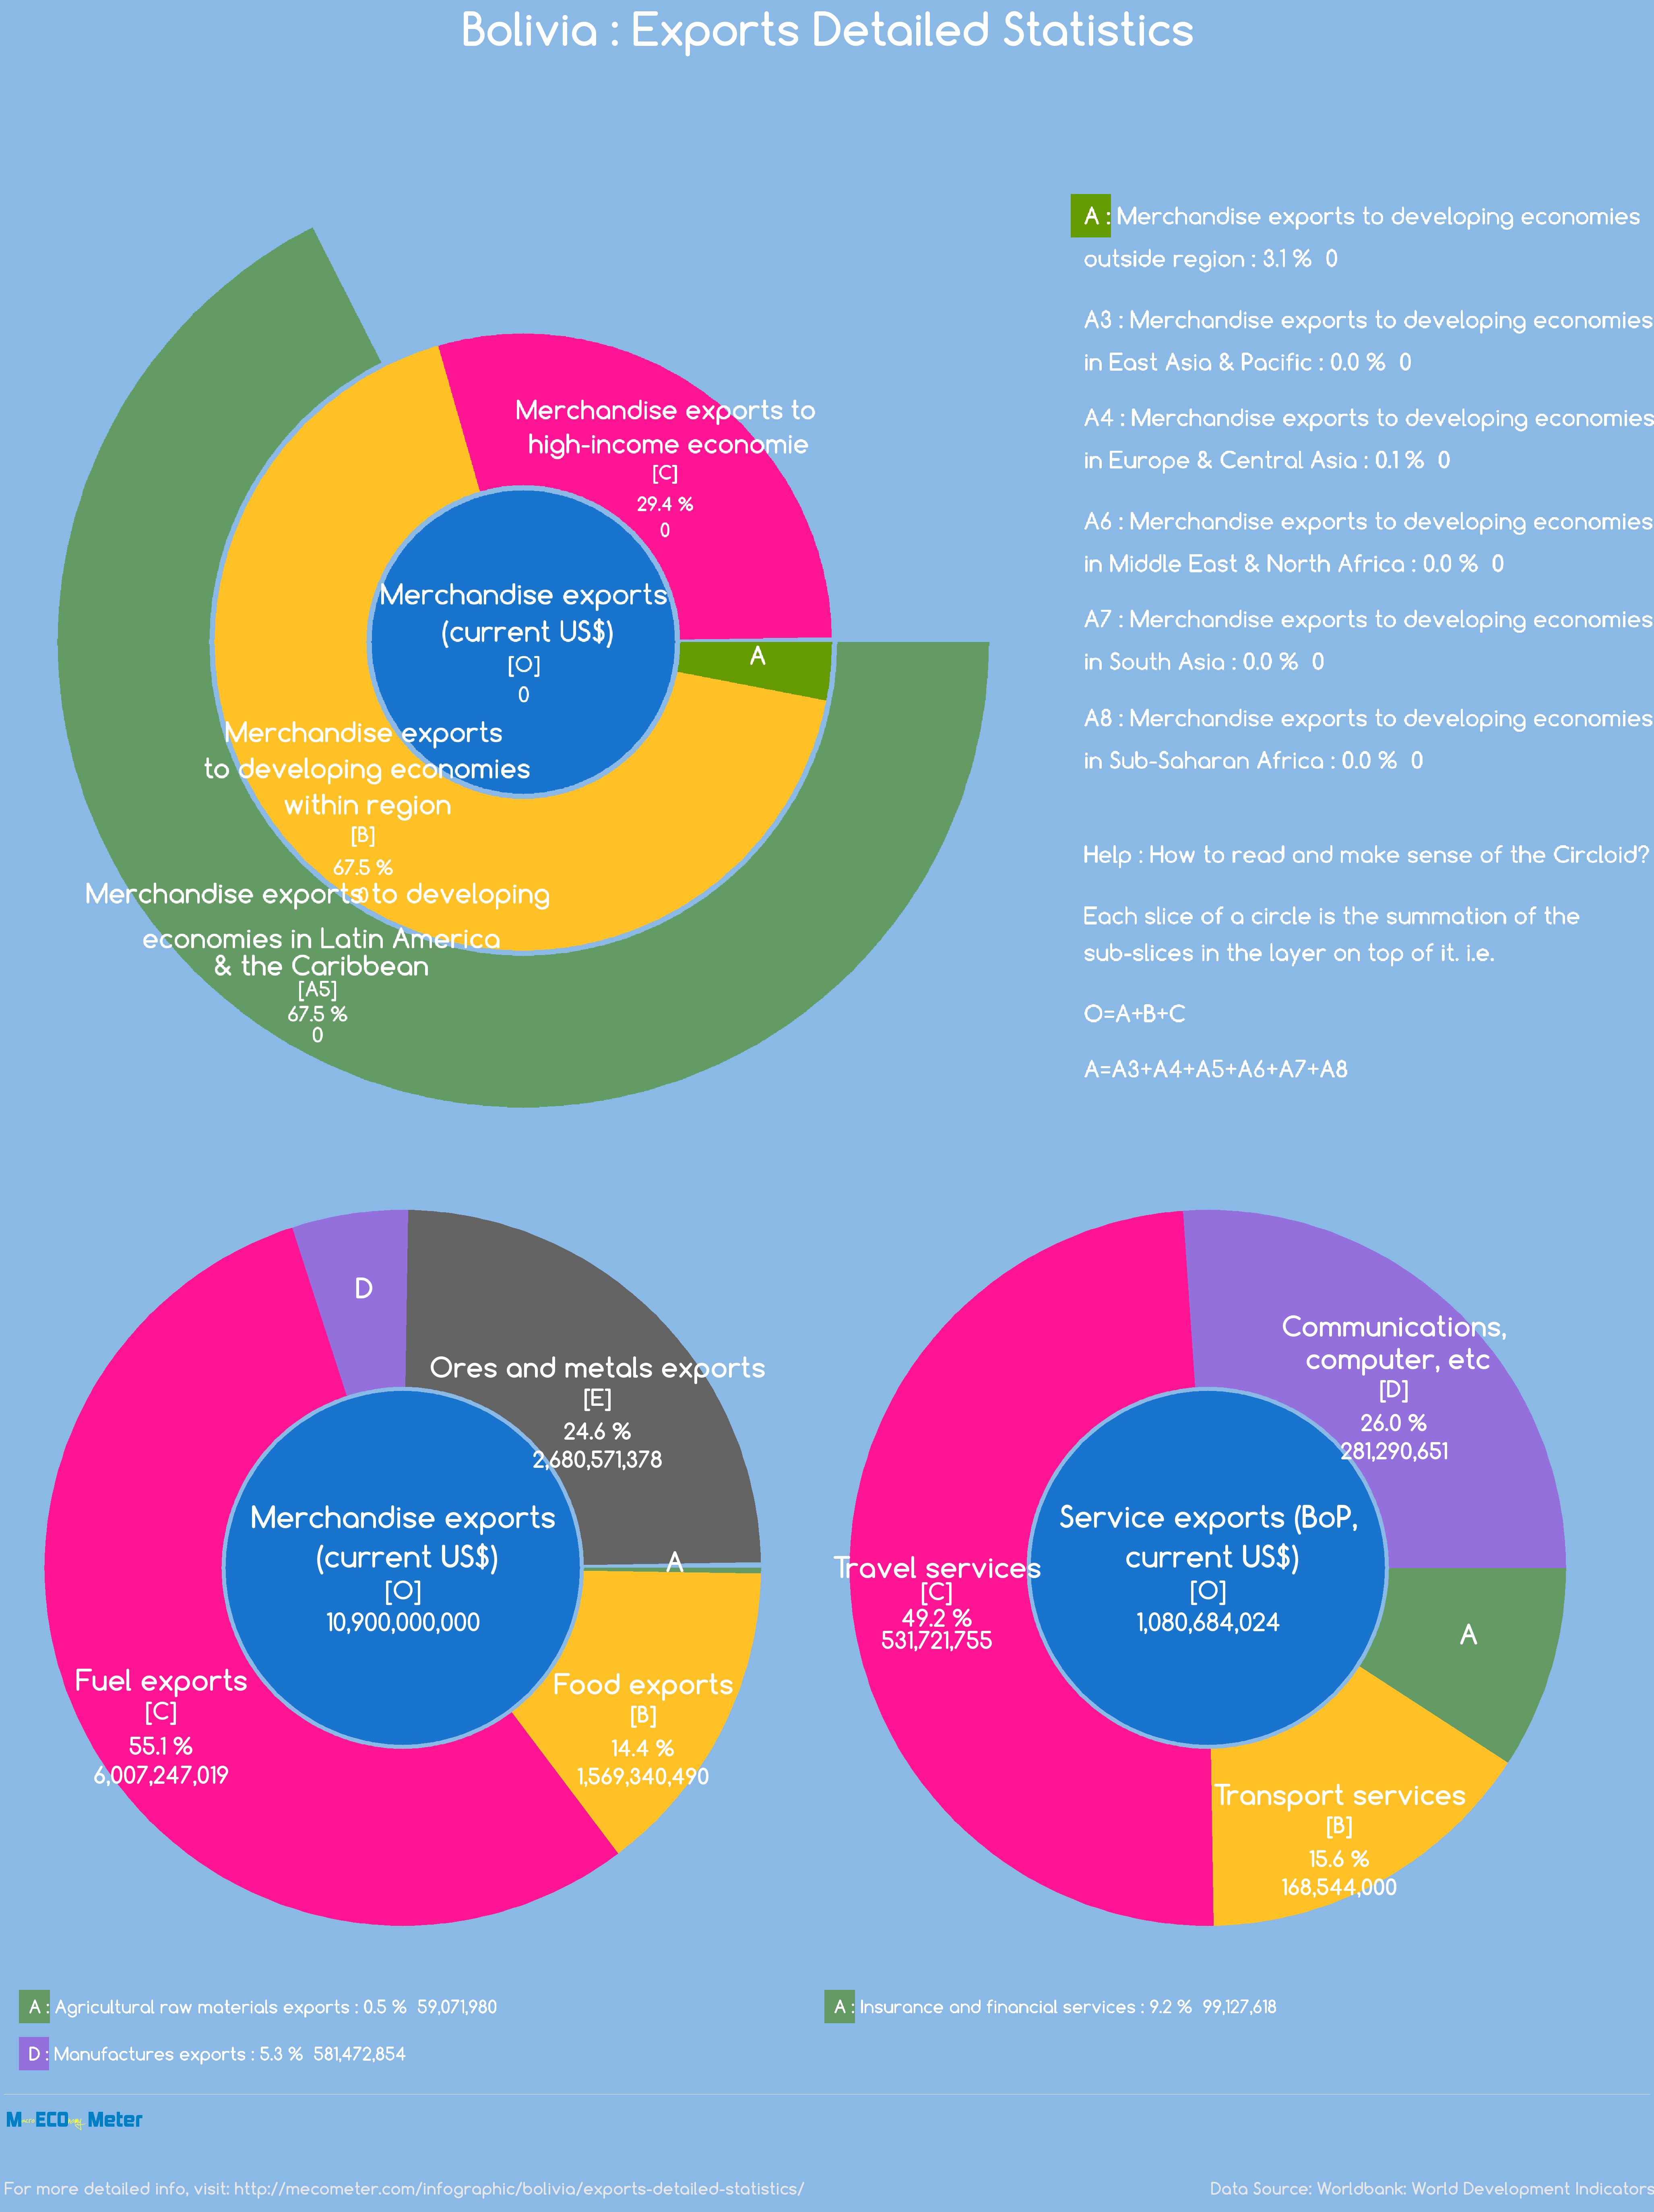 Bolivia : Exports Detailed Statistics